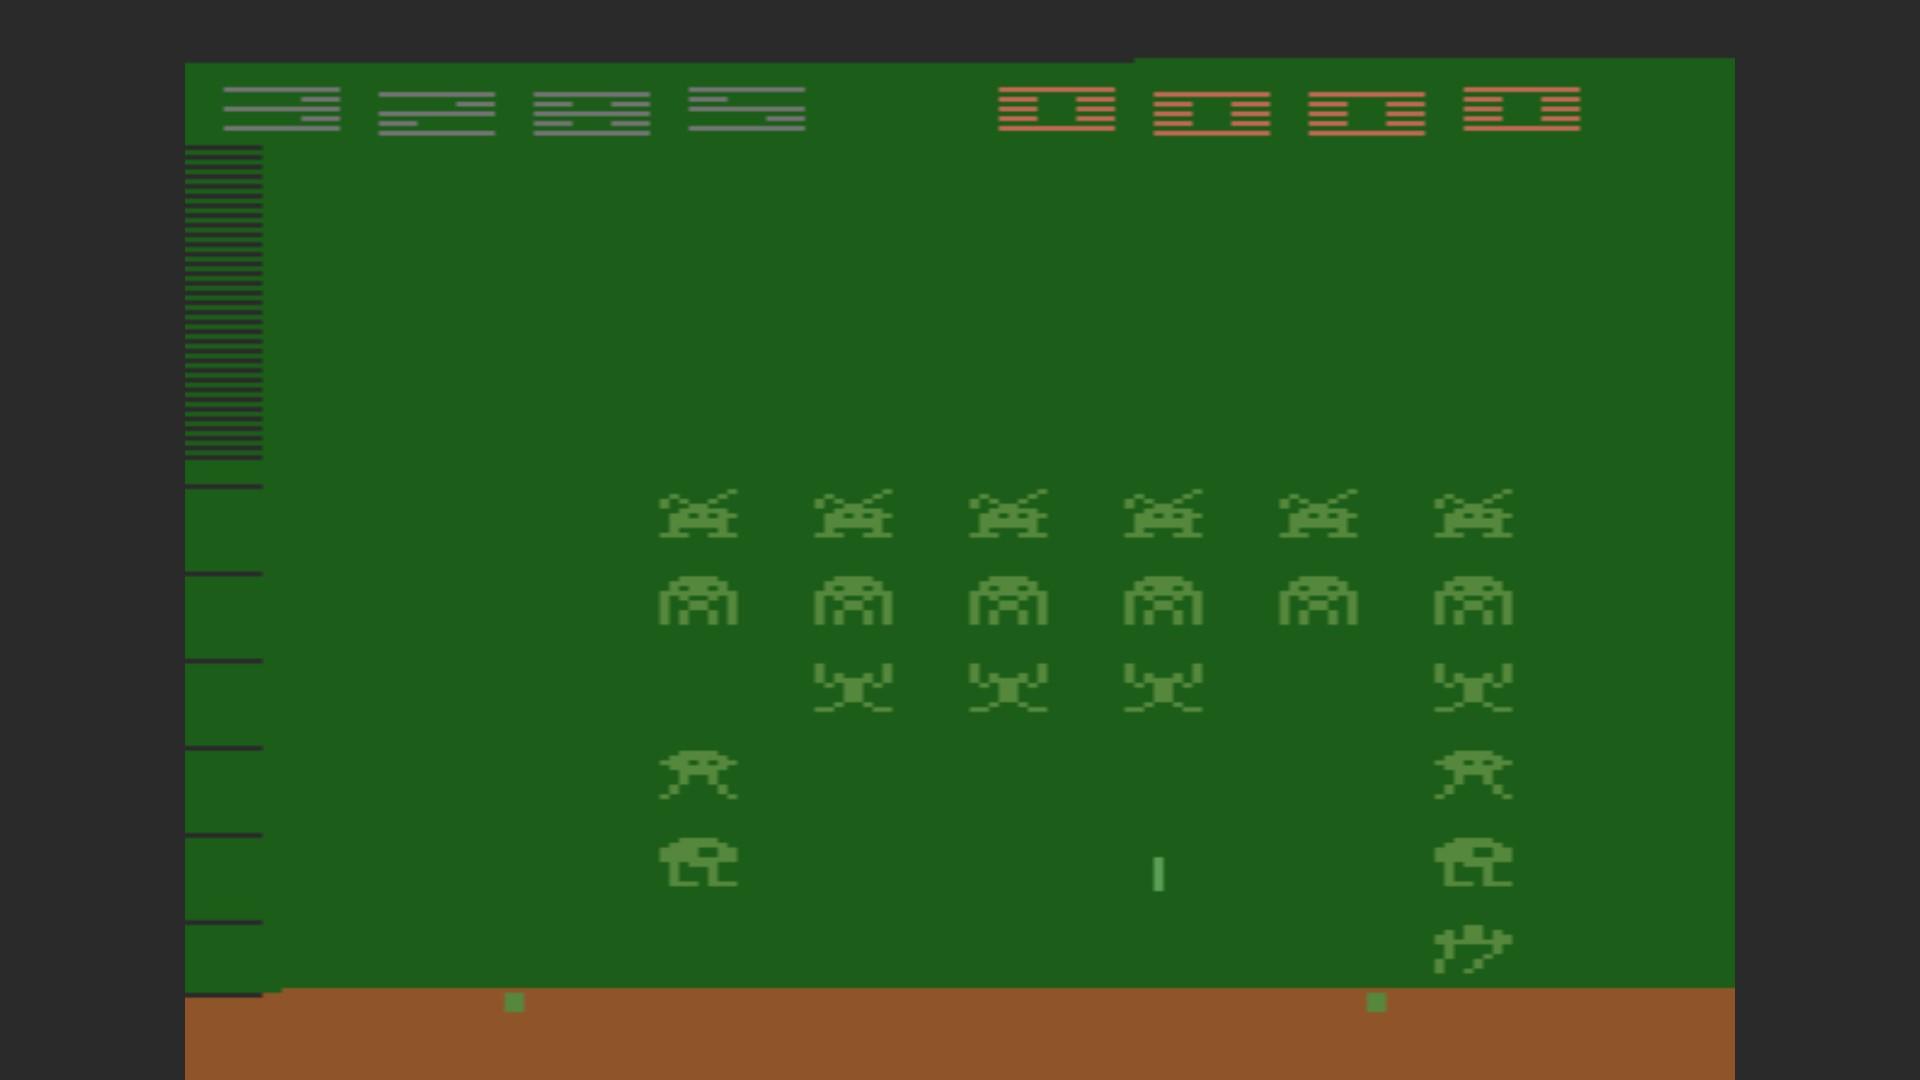 AkinNahtanoj: Space Invaders (Atari 2600 Emulated Novice/B Mode) 3,285 points on 2020-10-14 07:03:53